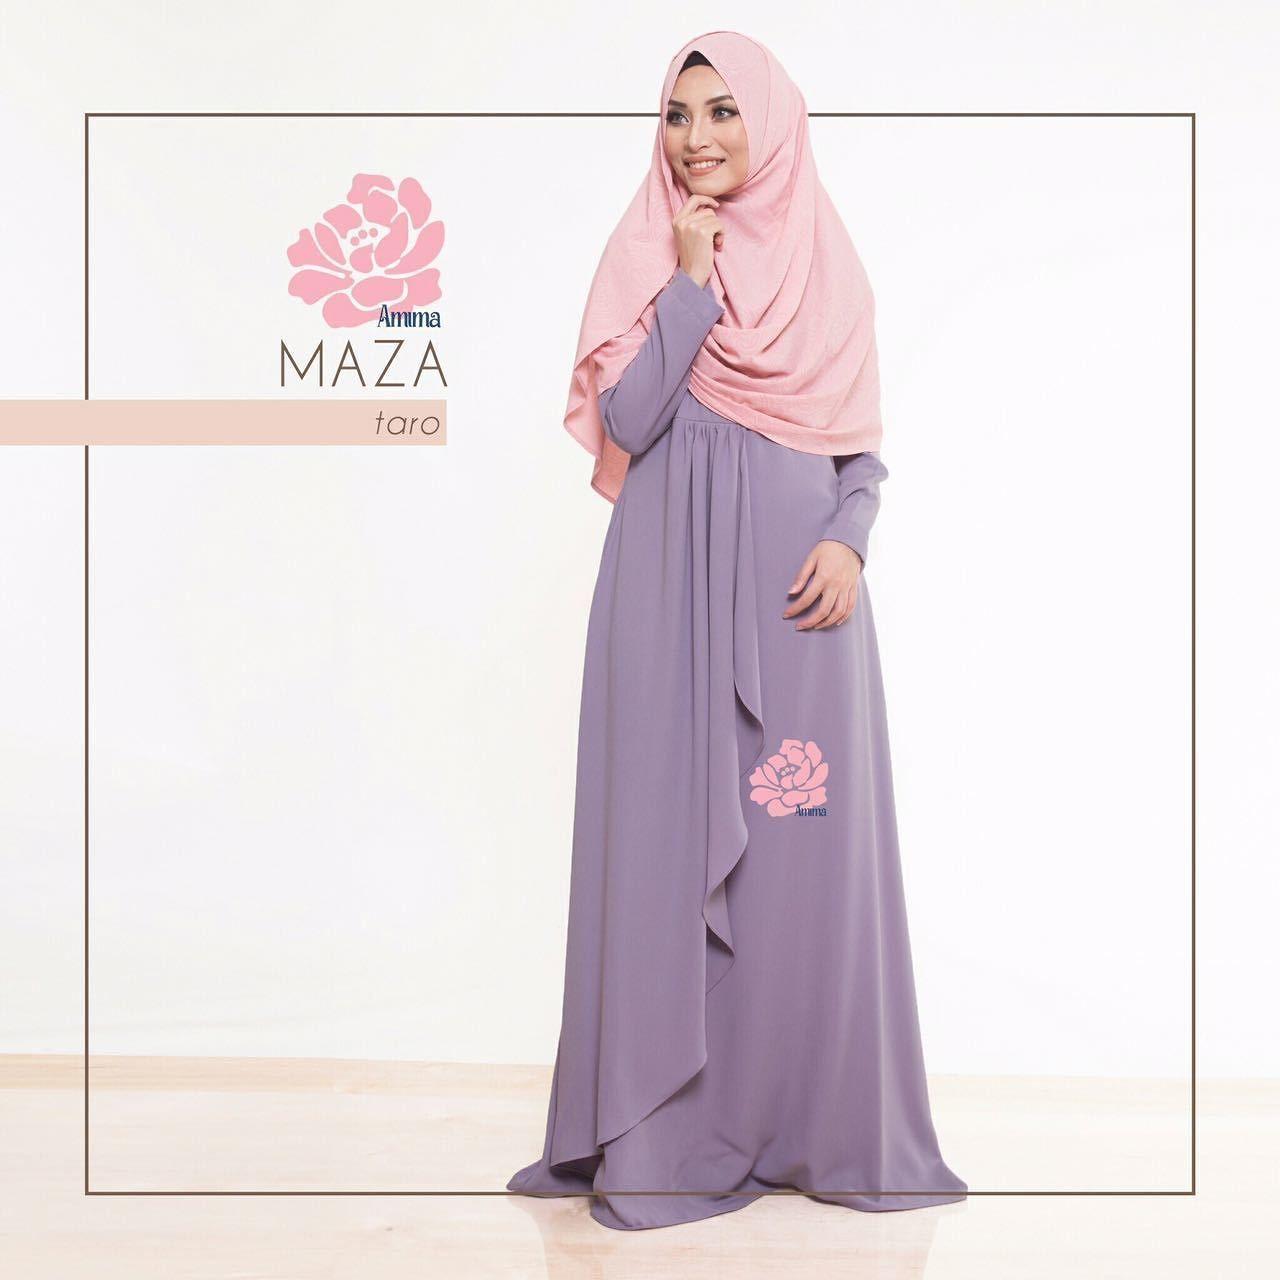 Gamis Amima Maza Dress Taro Baju Gamis Wanita Busana Muslim